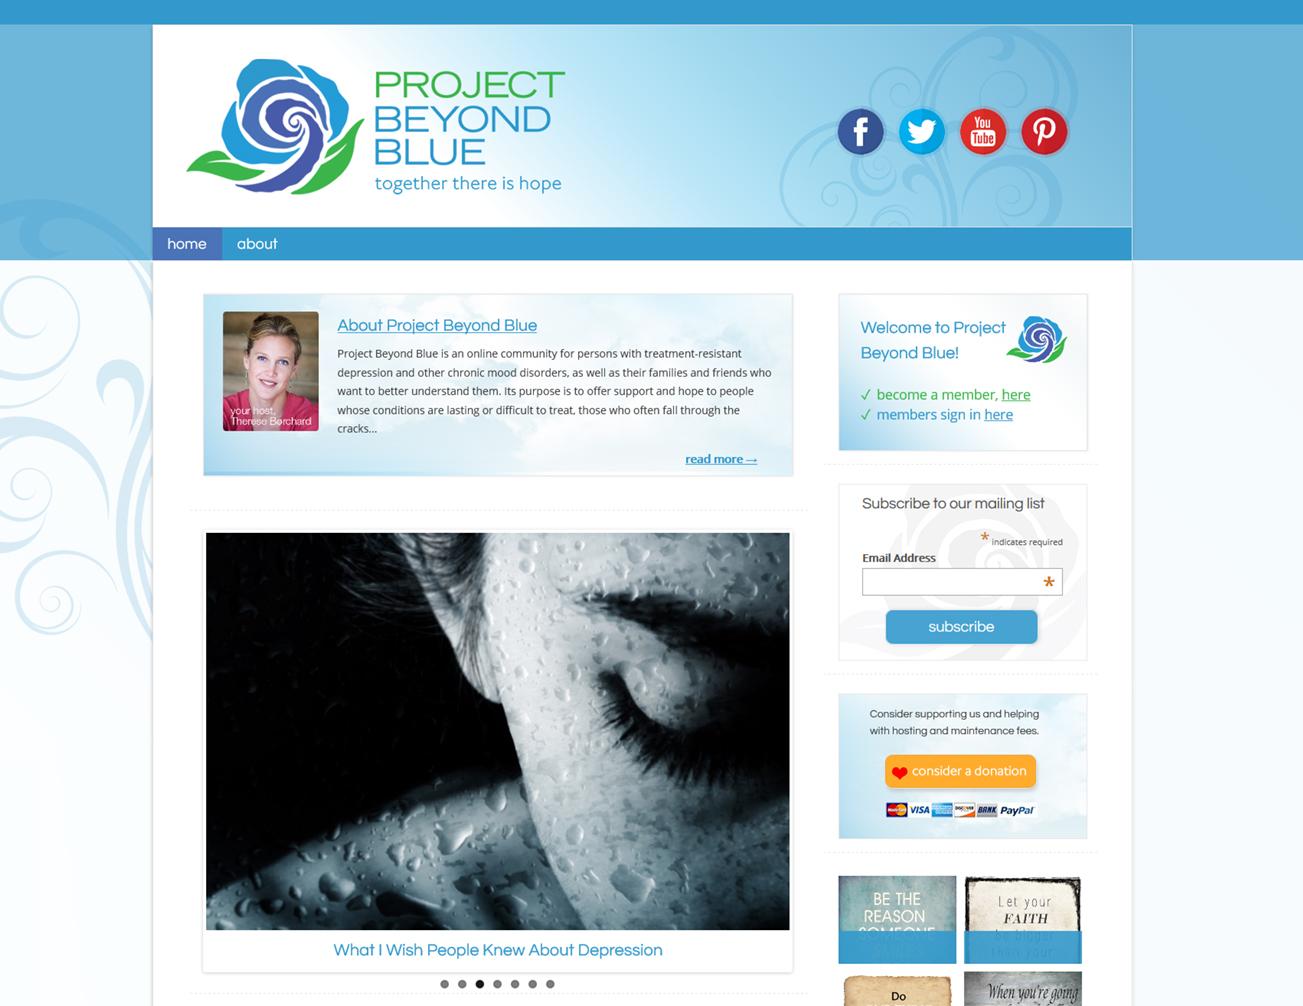 Project Beyond Blue - Ning 3.0 Design